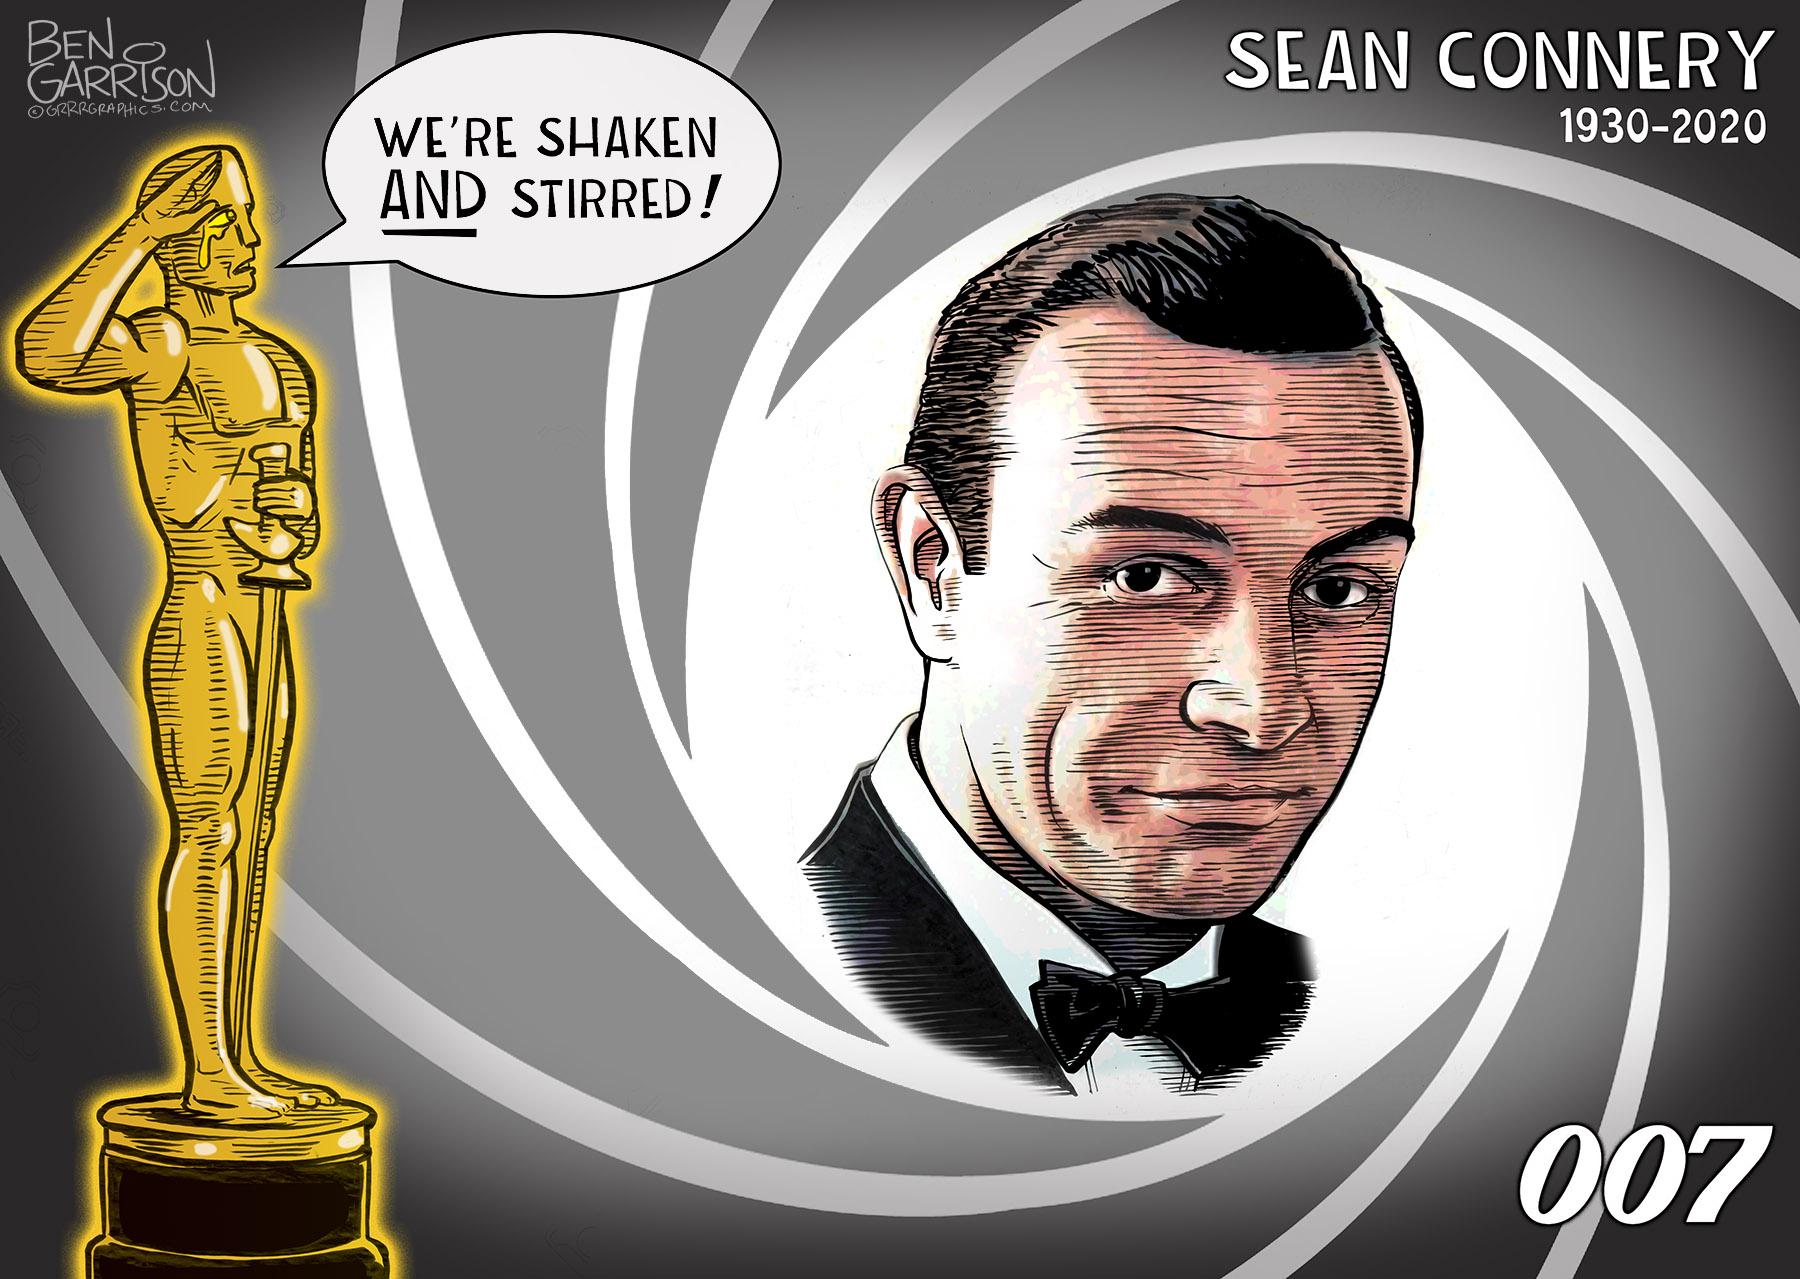 James Bond RIP Sean Connery - Grrr Graphics